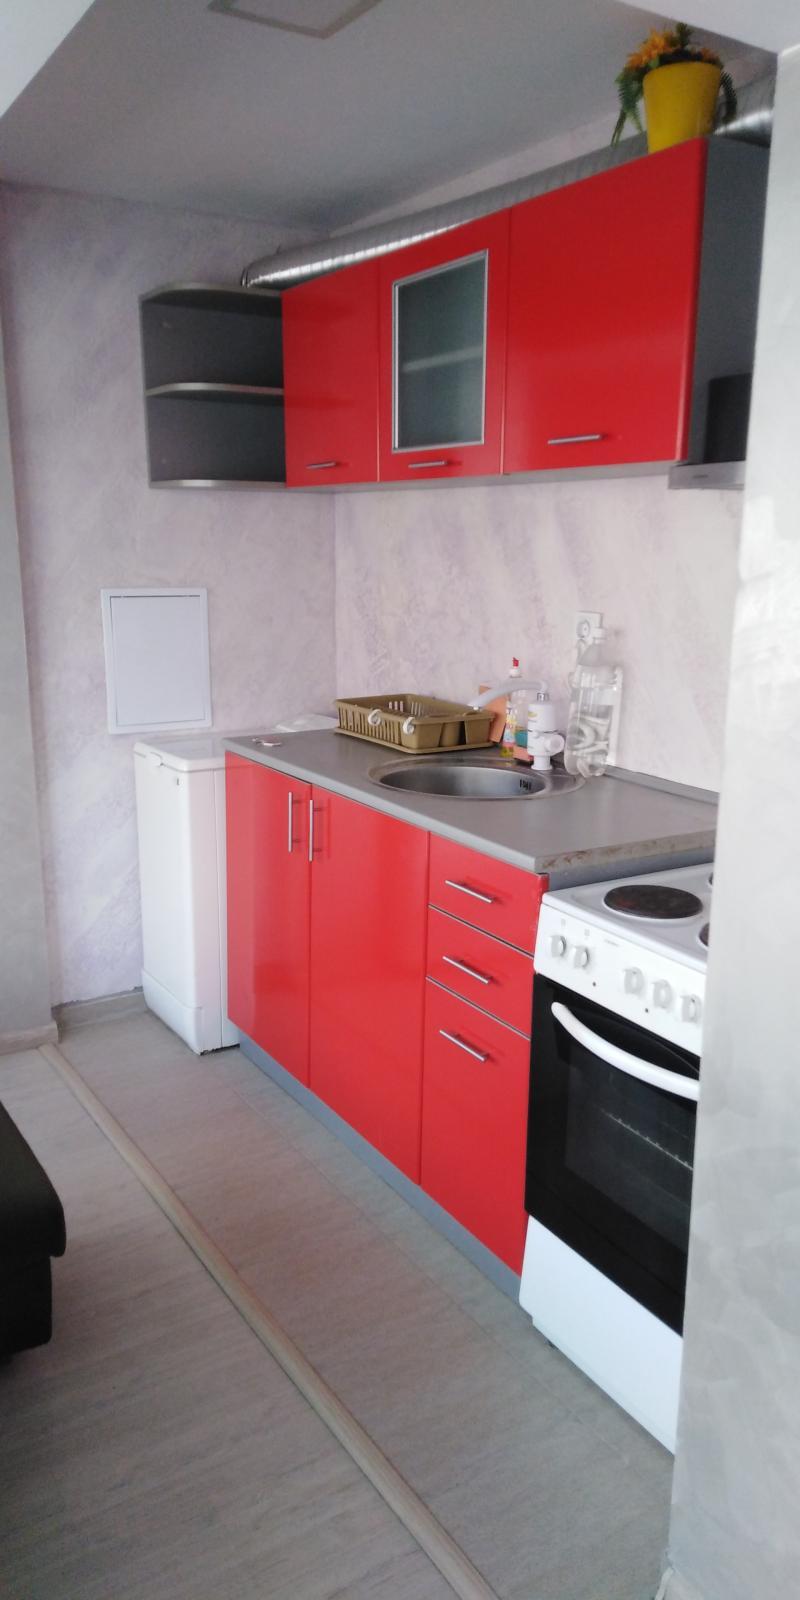 1-стаен, Бургас,<br />Лазур, 49 м², 300 лв<br /><label>отдава</label>